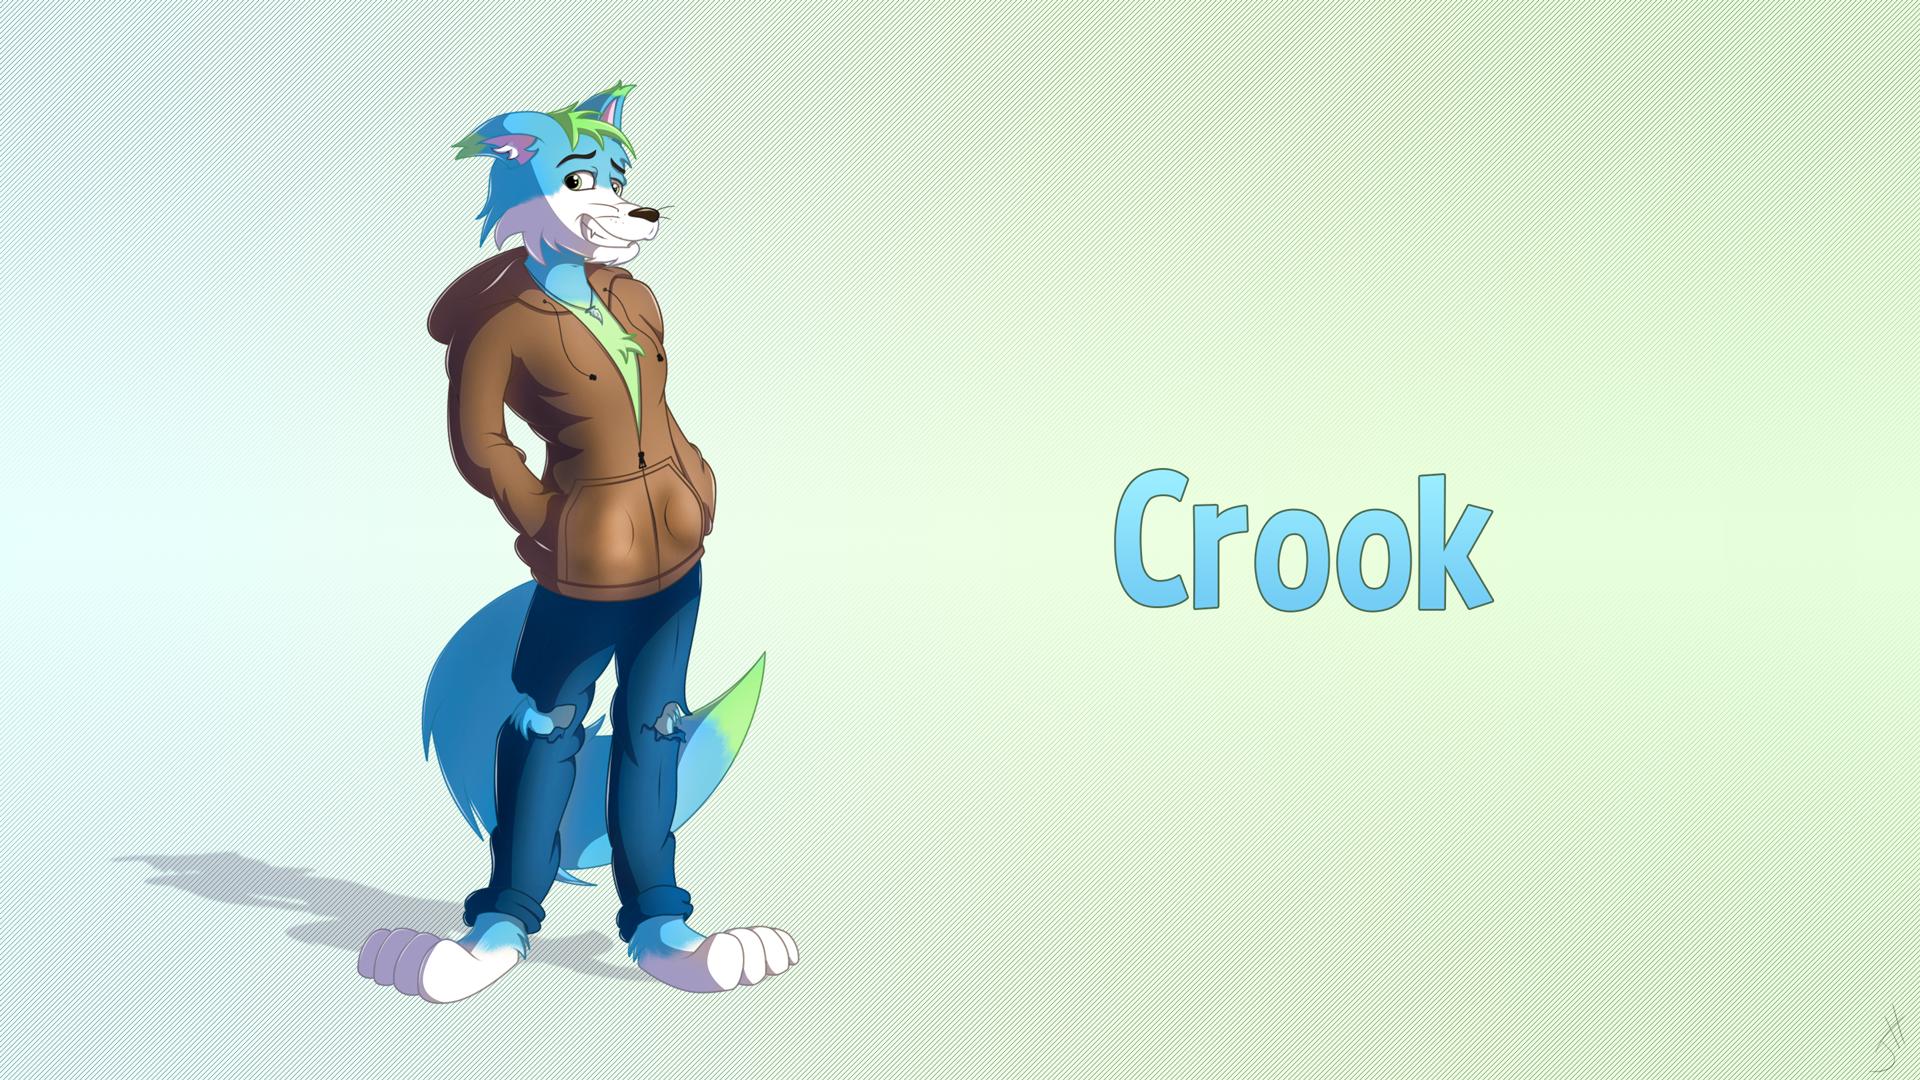 Crook